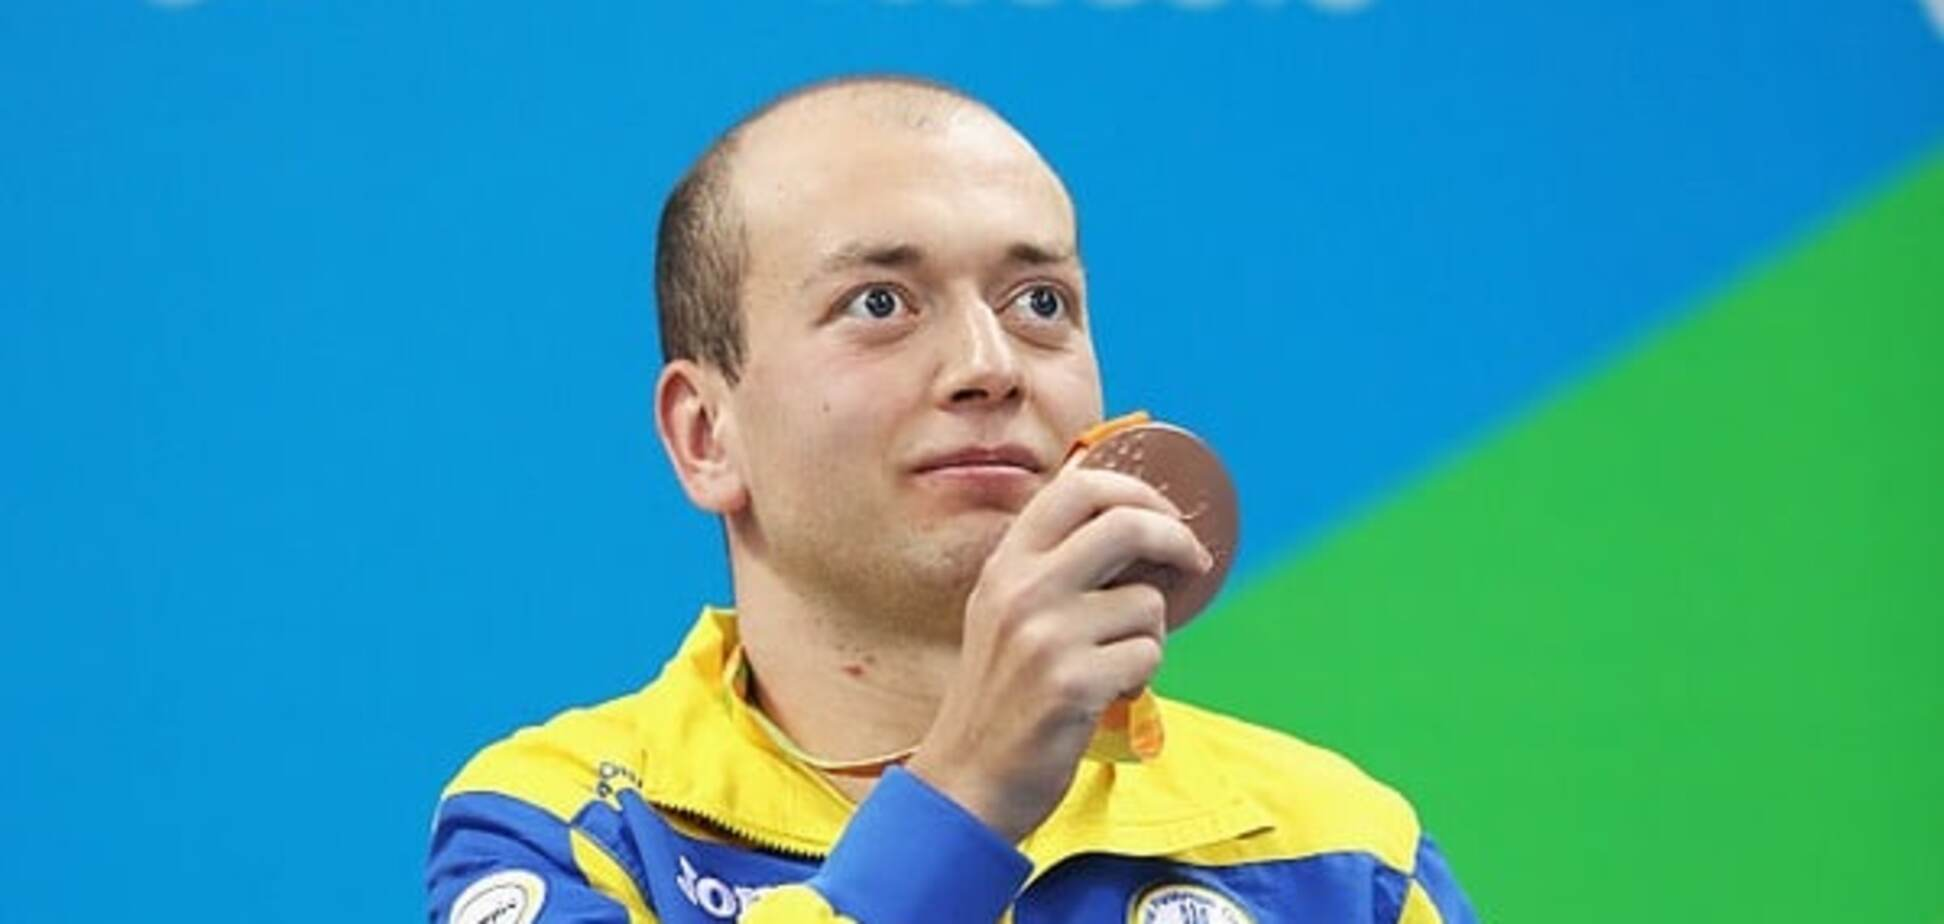 Україна втрималася у топ-3 медального заліку Паралімпіади-2016